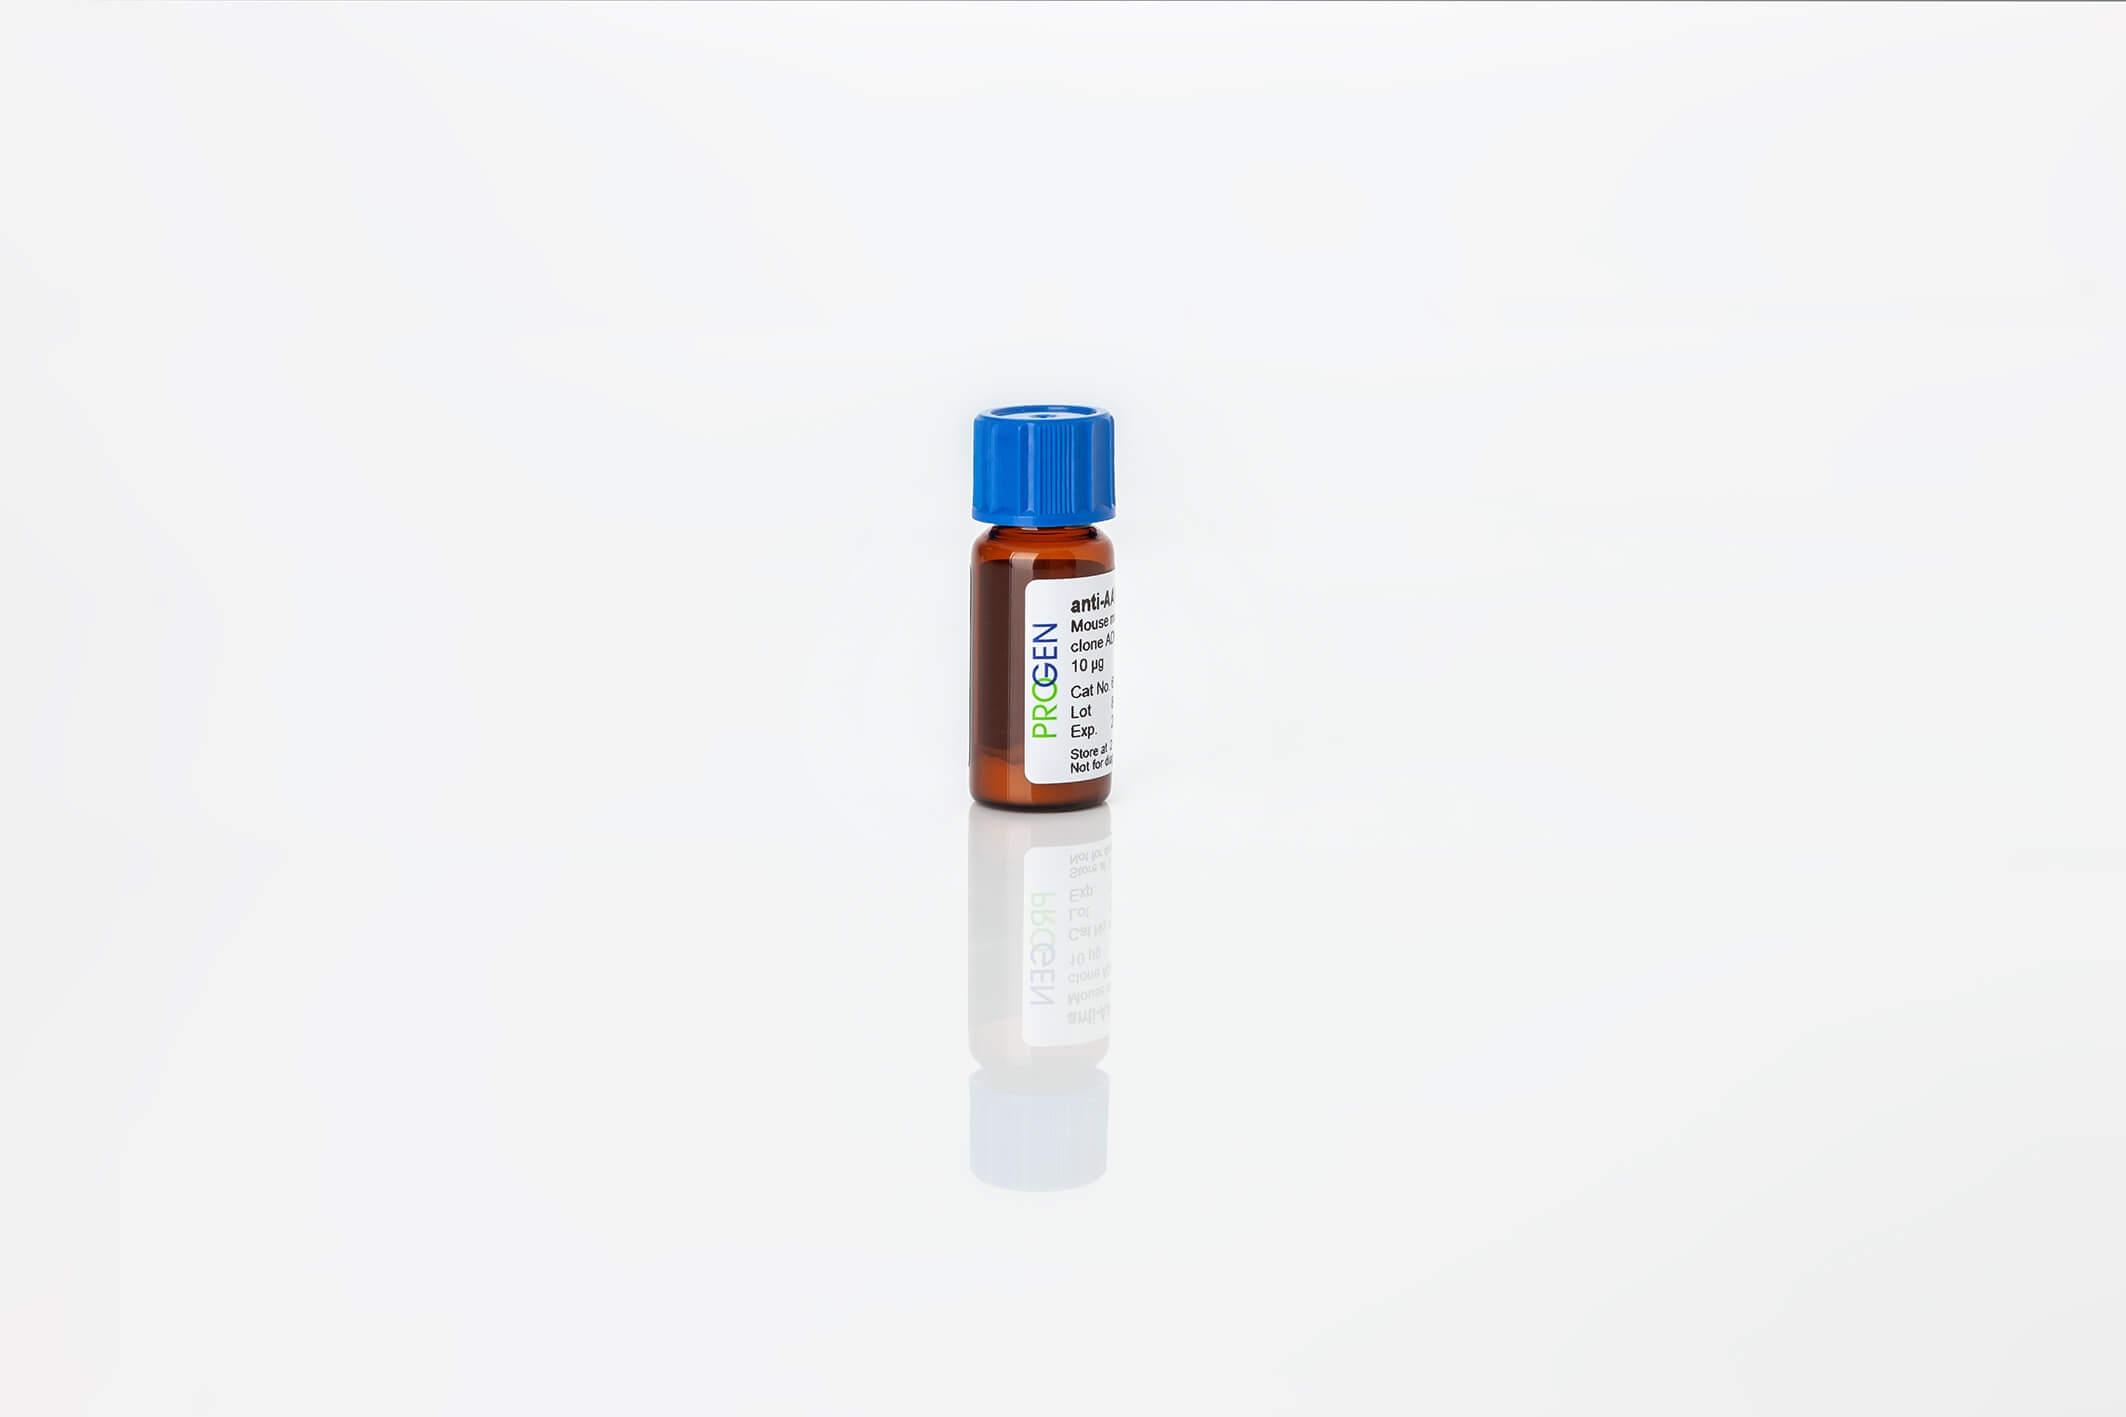 anti-Keratin K18 mouse monoclonal, RCK106, supernatant